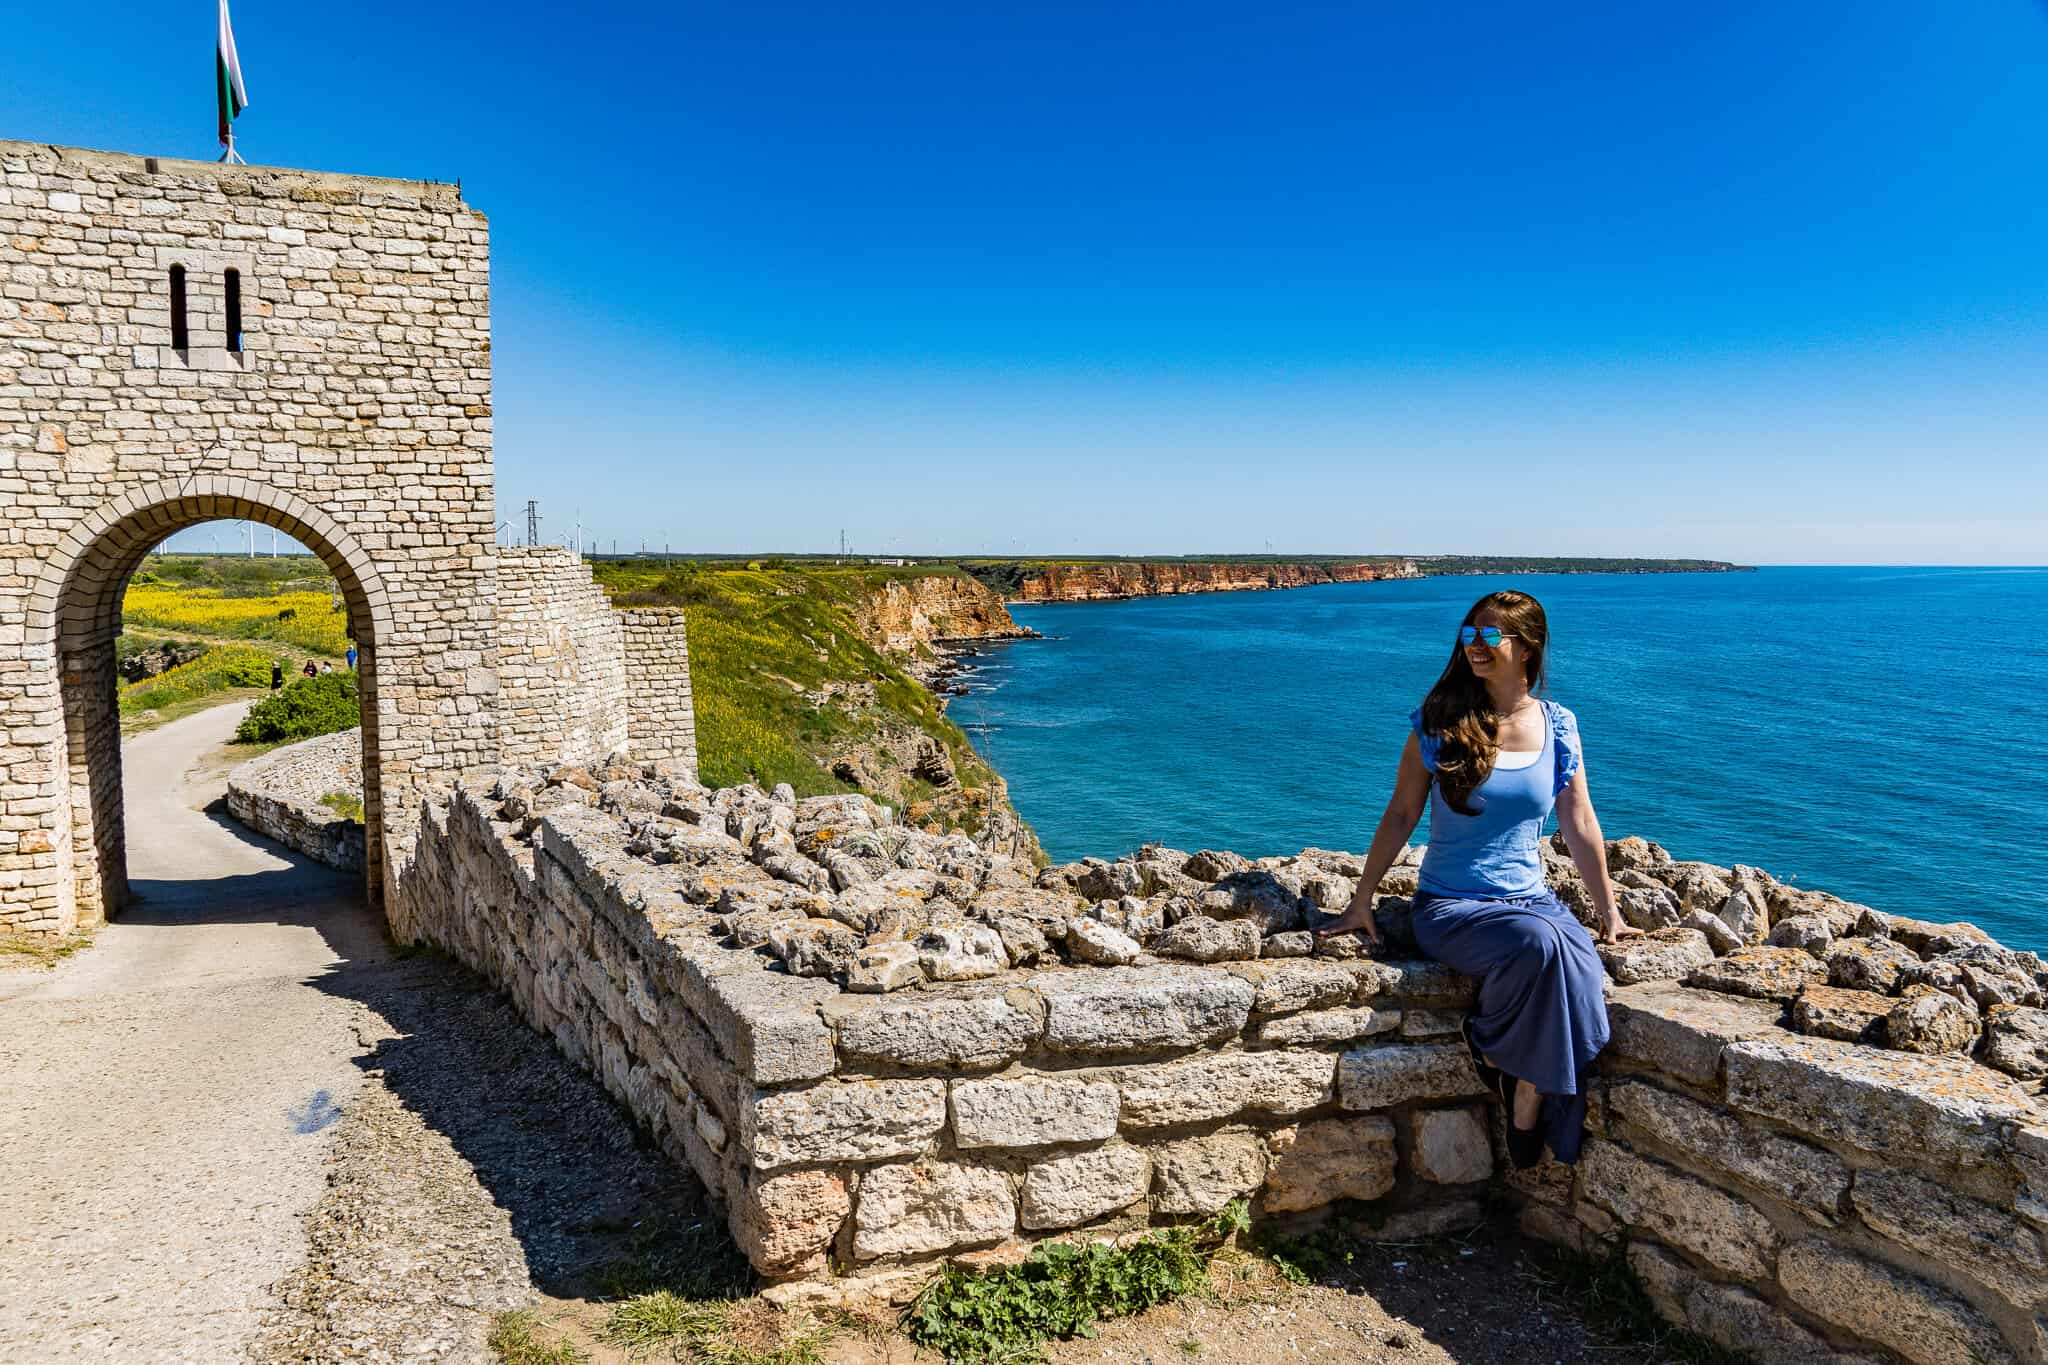 Barbara am Kap Kaliakra im Bulgarienurlaub